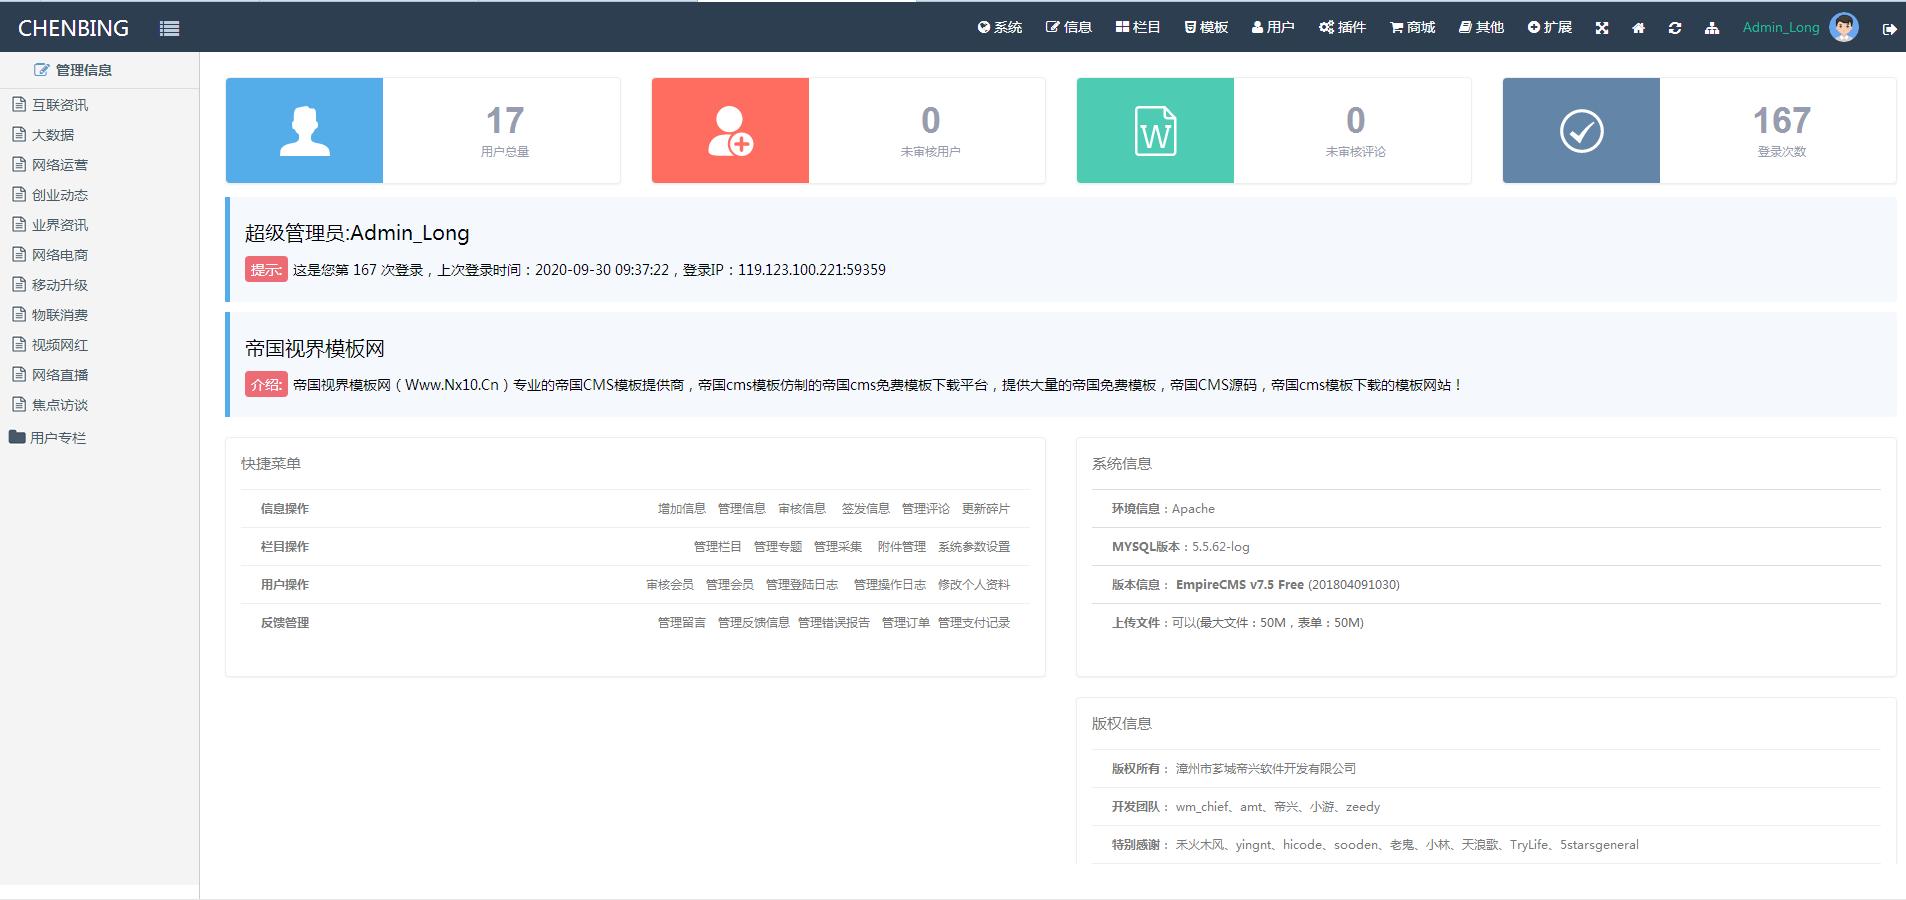 "image.png 帝国CMS后台首页的""帝国之家正版模板提示文字""如何修改删除? 帝国CMS教程 第1张"